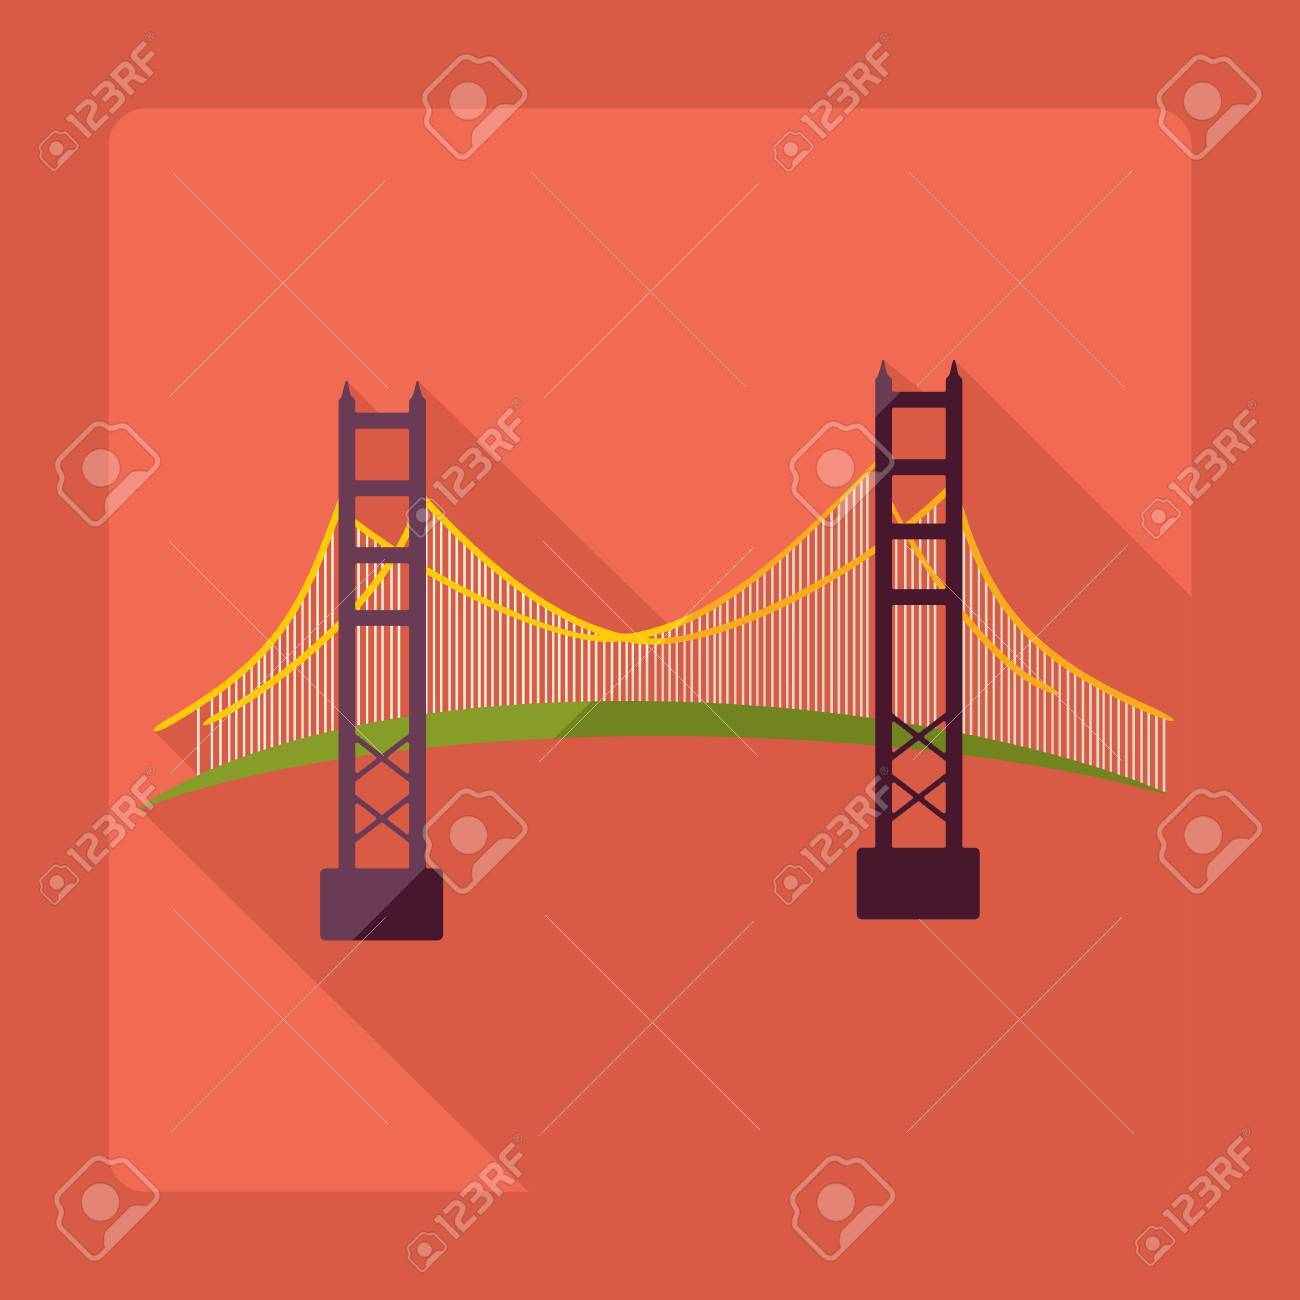 Flat modern design with shadow San Francisco Golden Gate bridge - 53030629